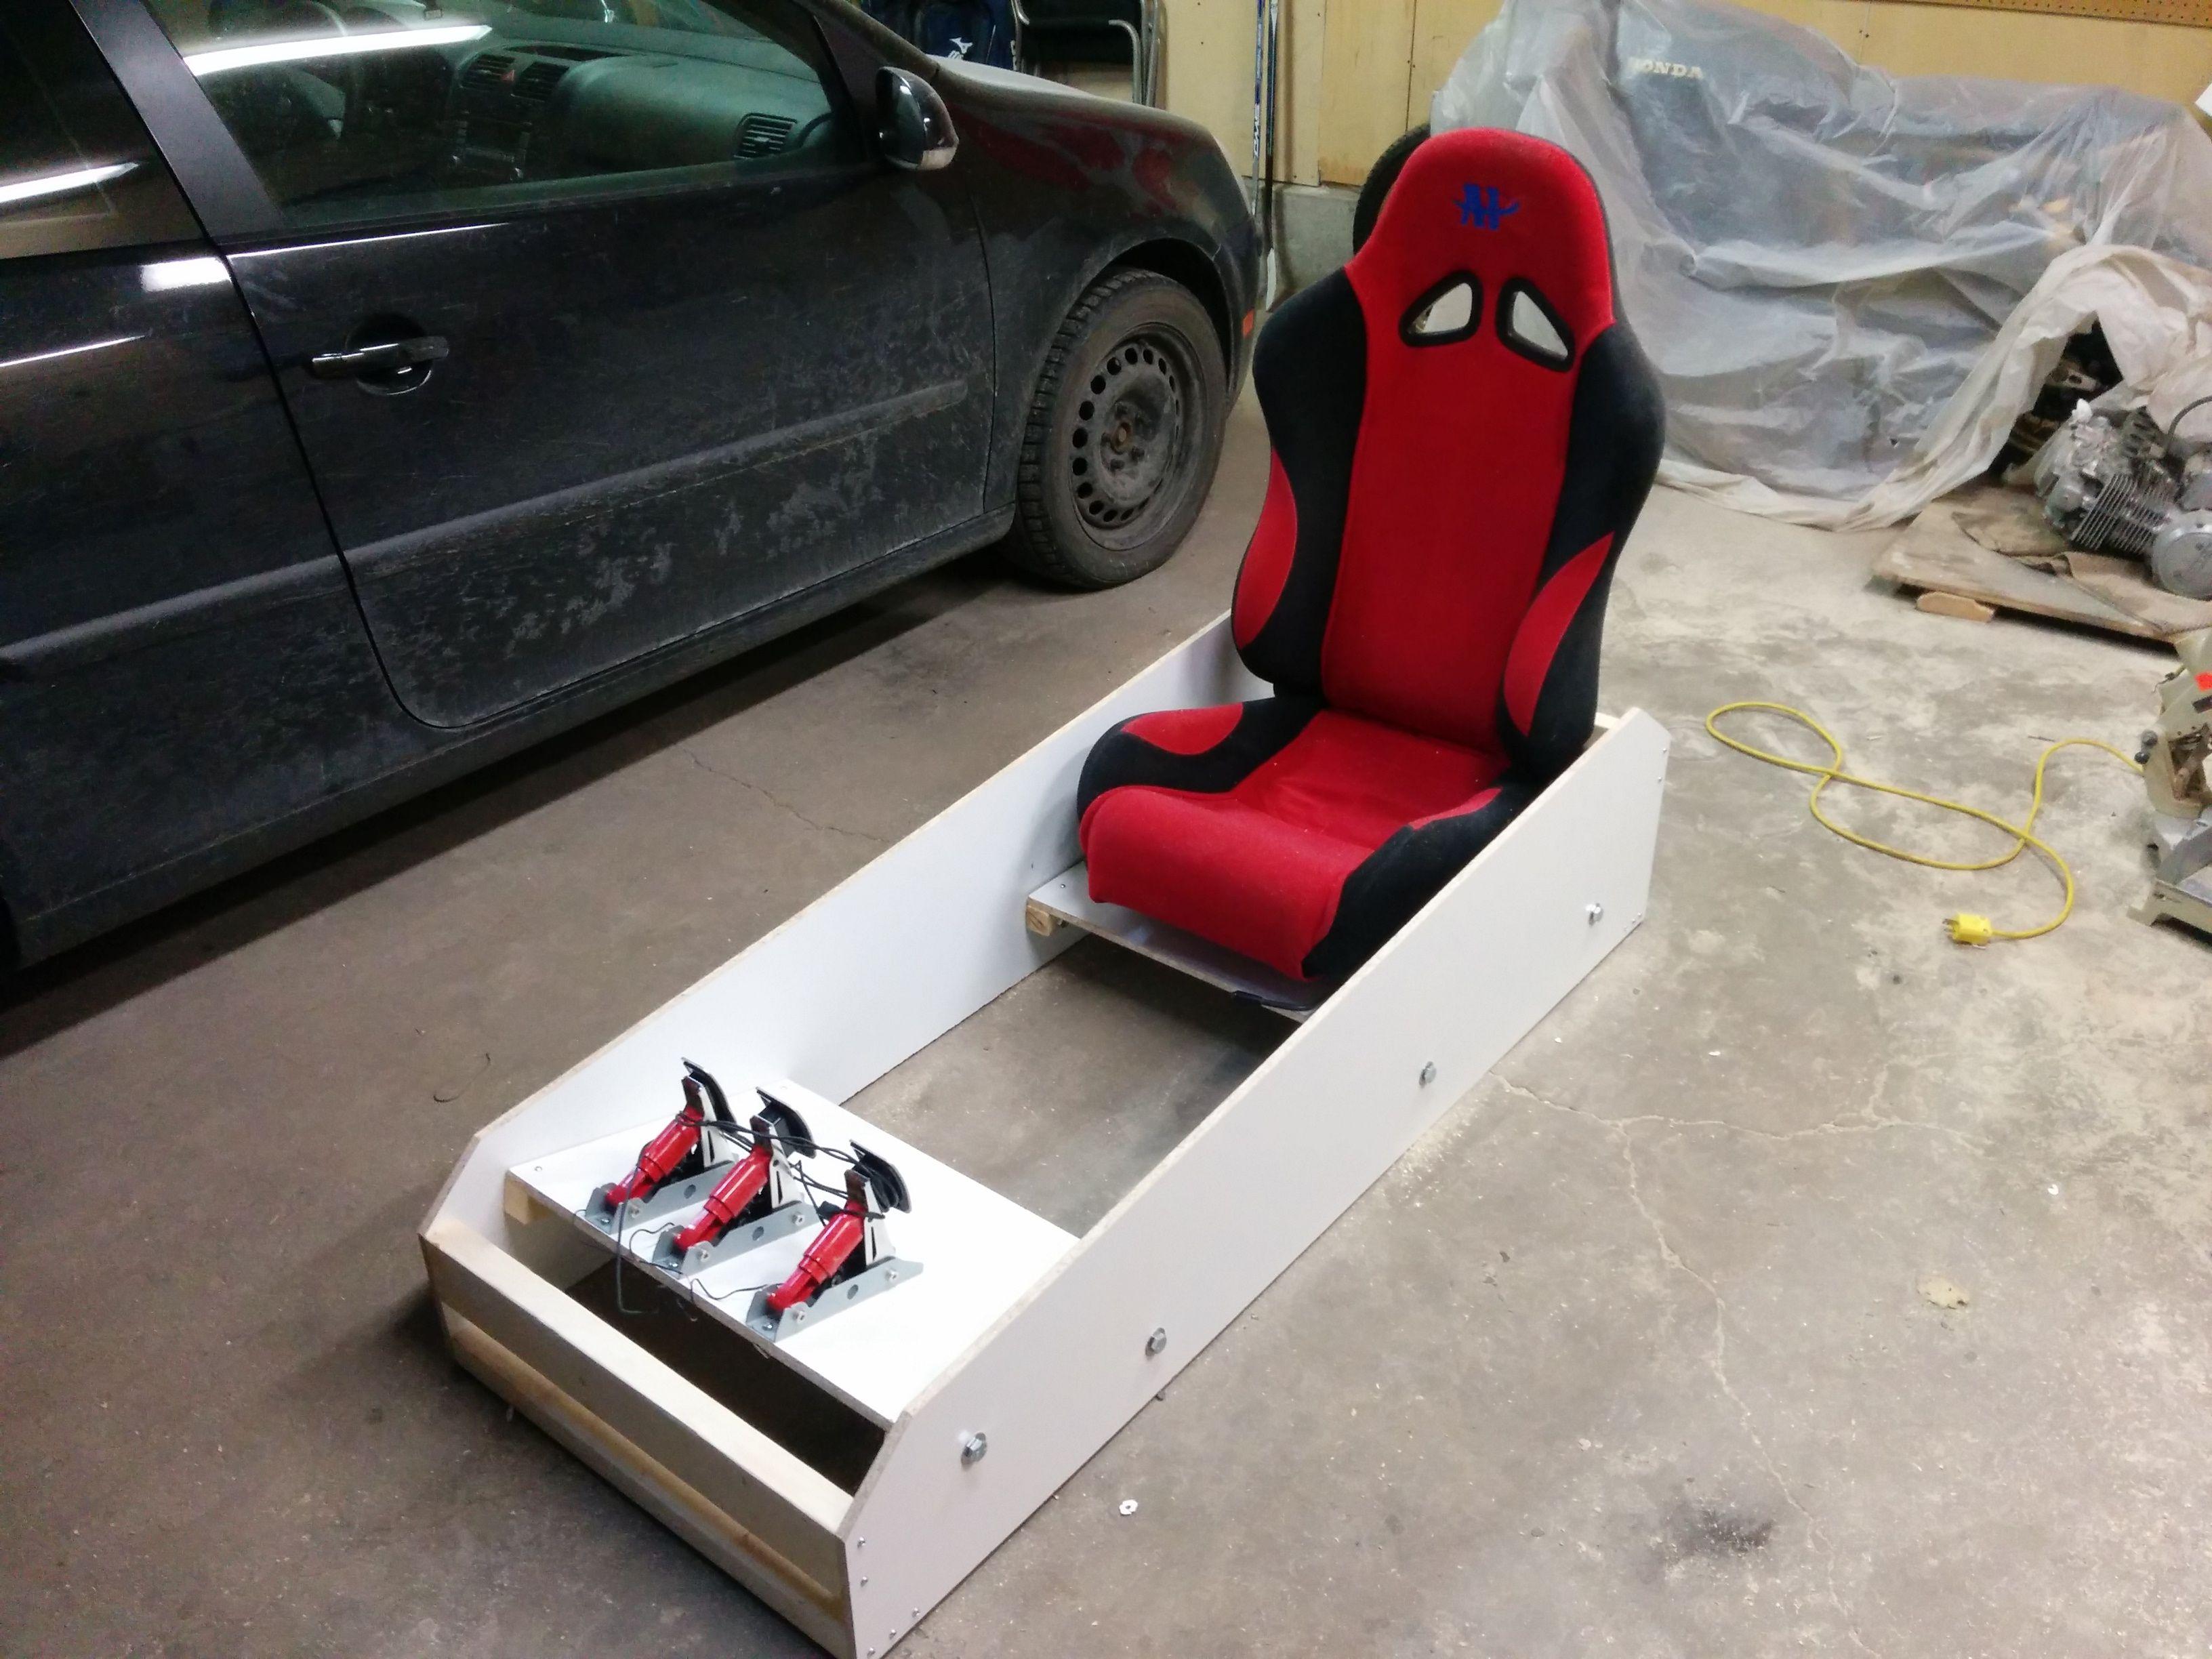 sim racing rig single weekend sub 250 design in 2019 gaming racing simulator sims. Black Bedroom Furniture Sets. Home Design Ideas